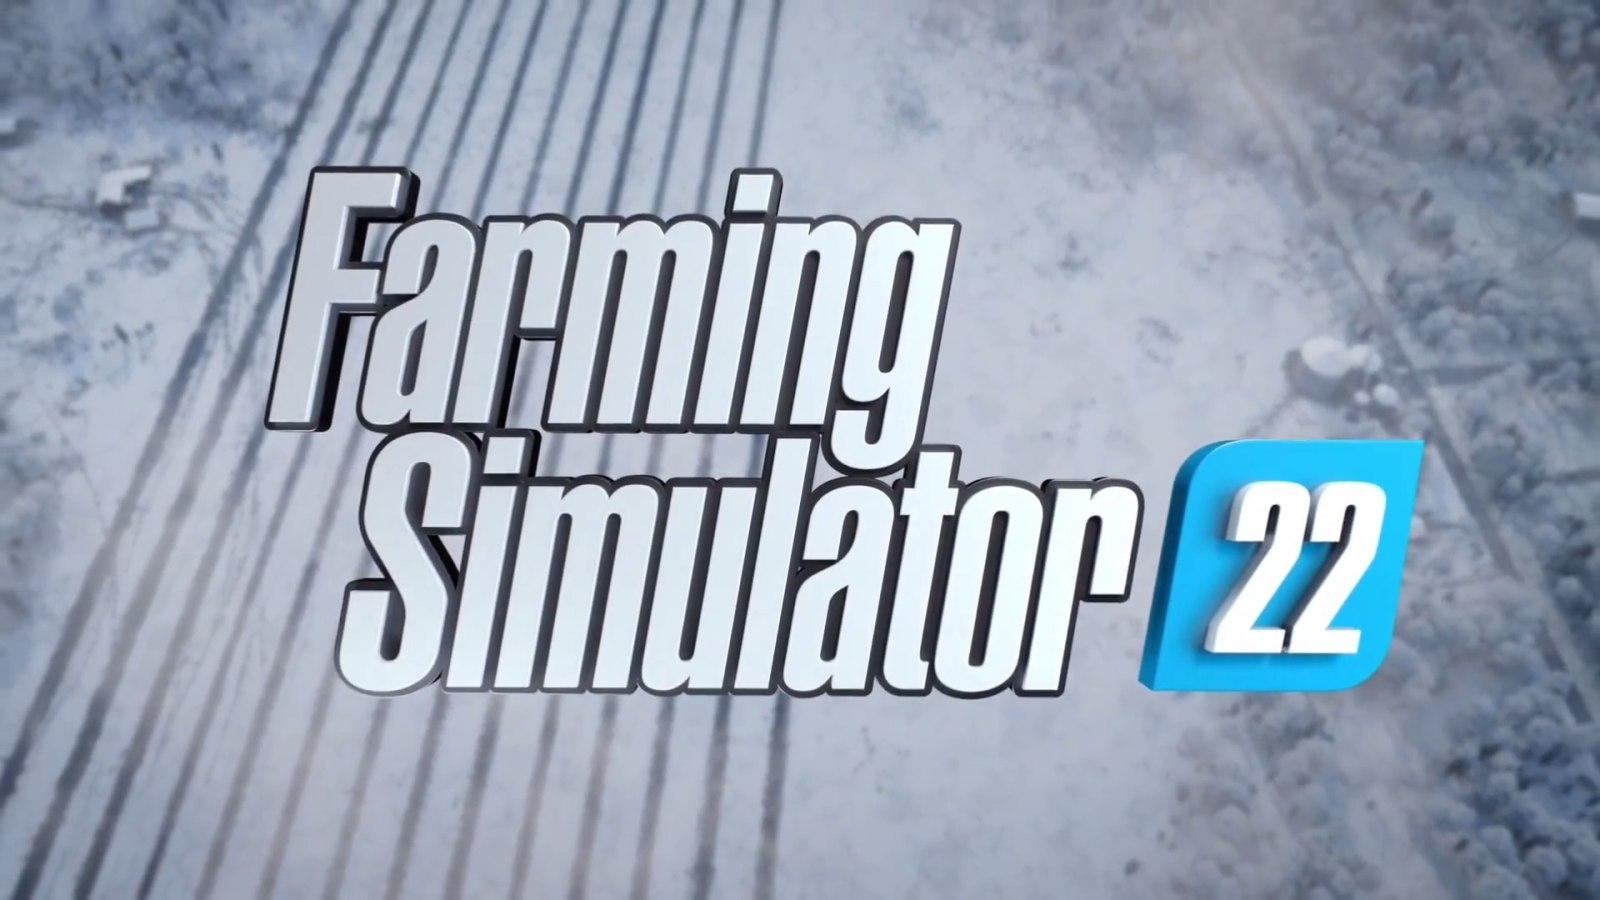 《Farming Simulator 22》公布全新预告,将于11月22日发售